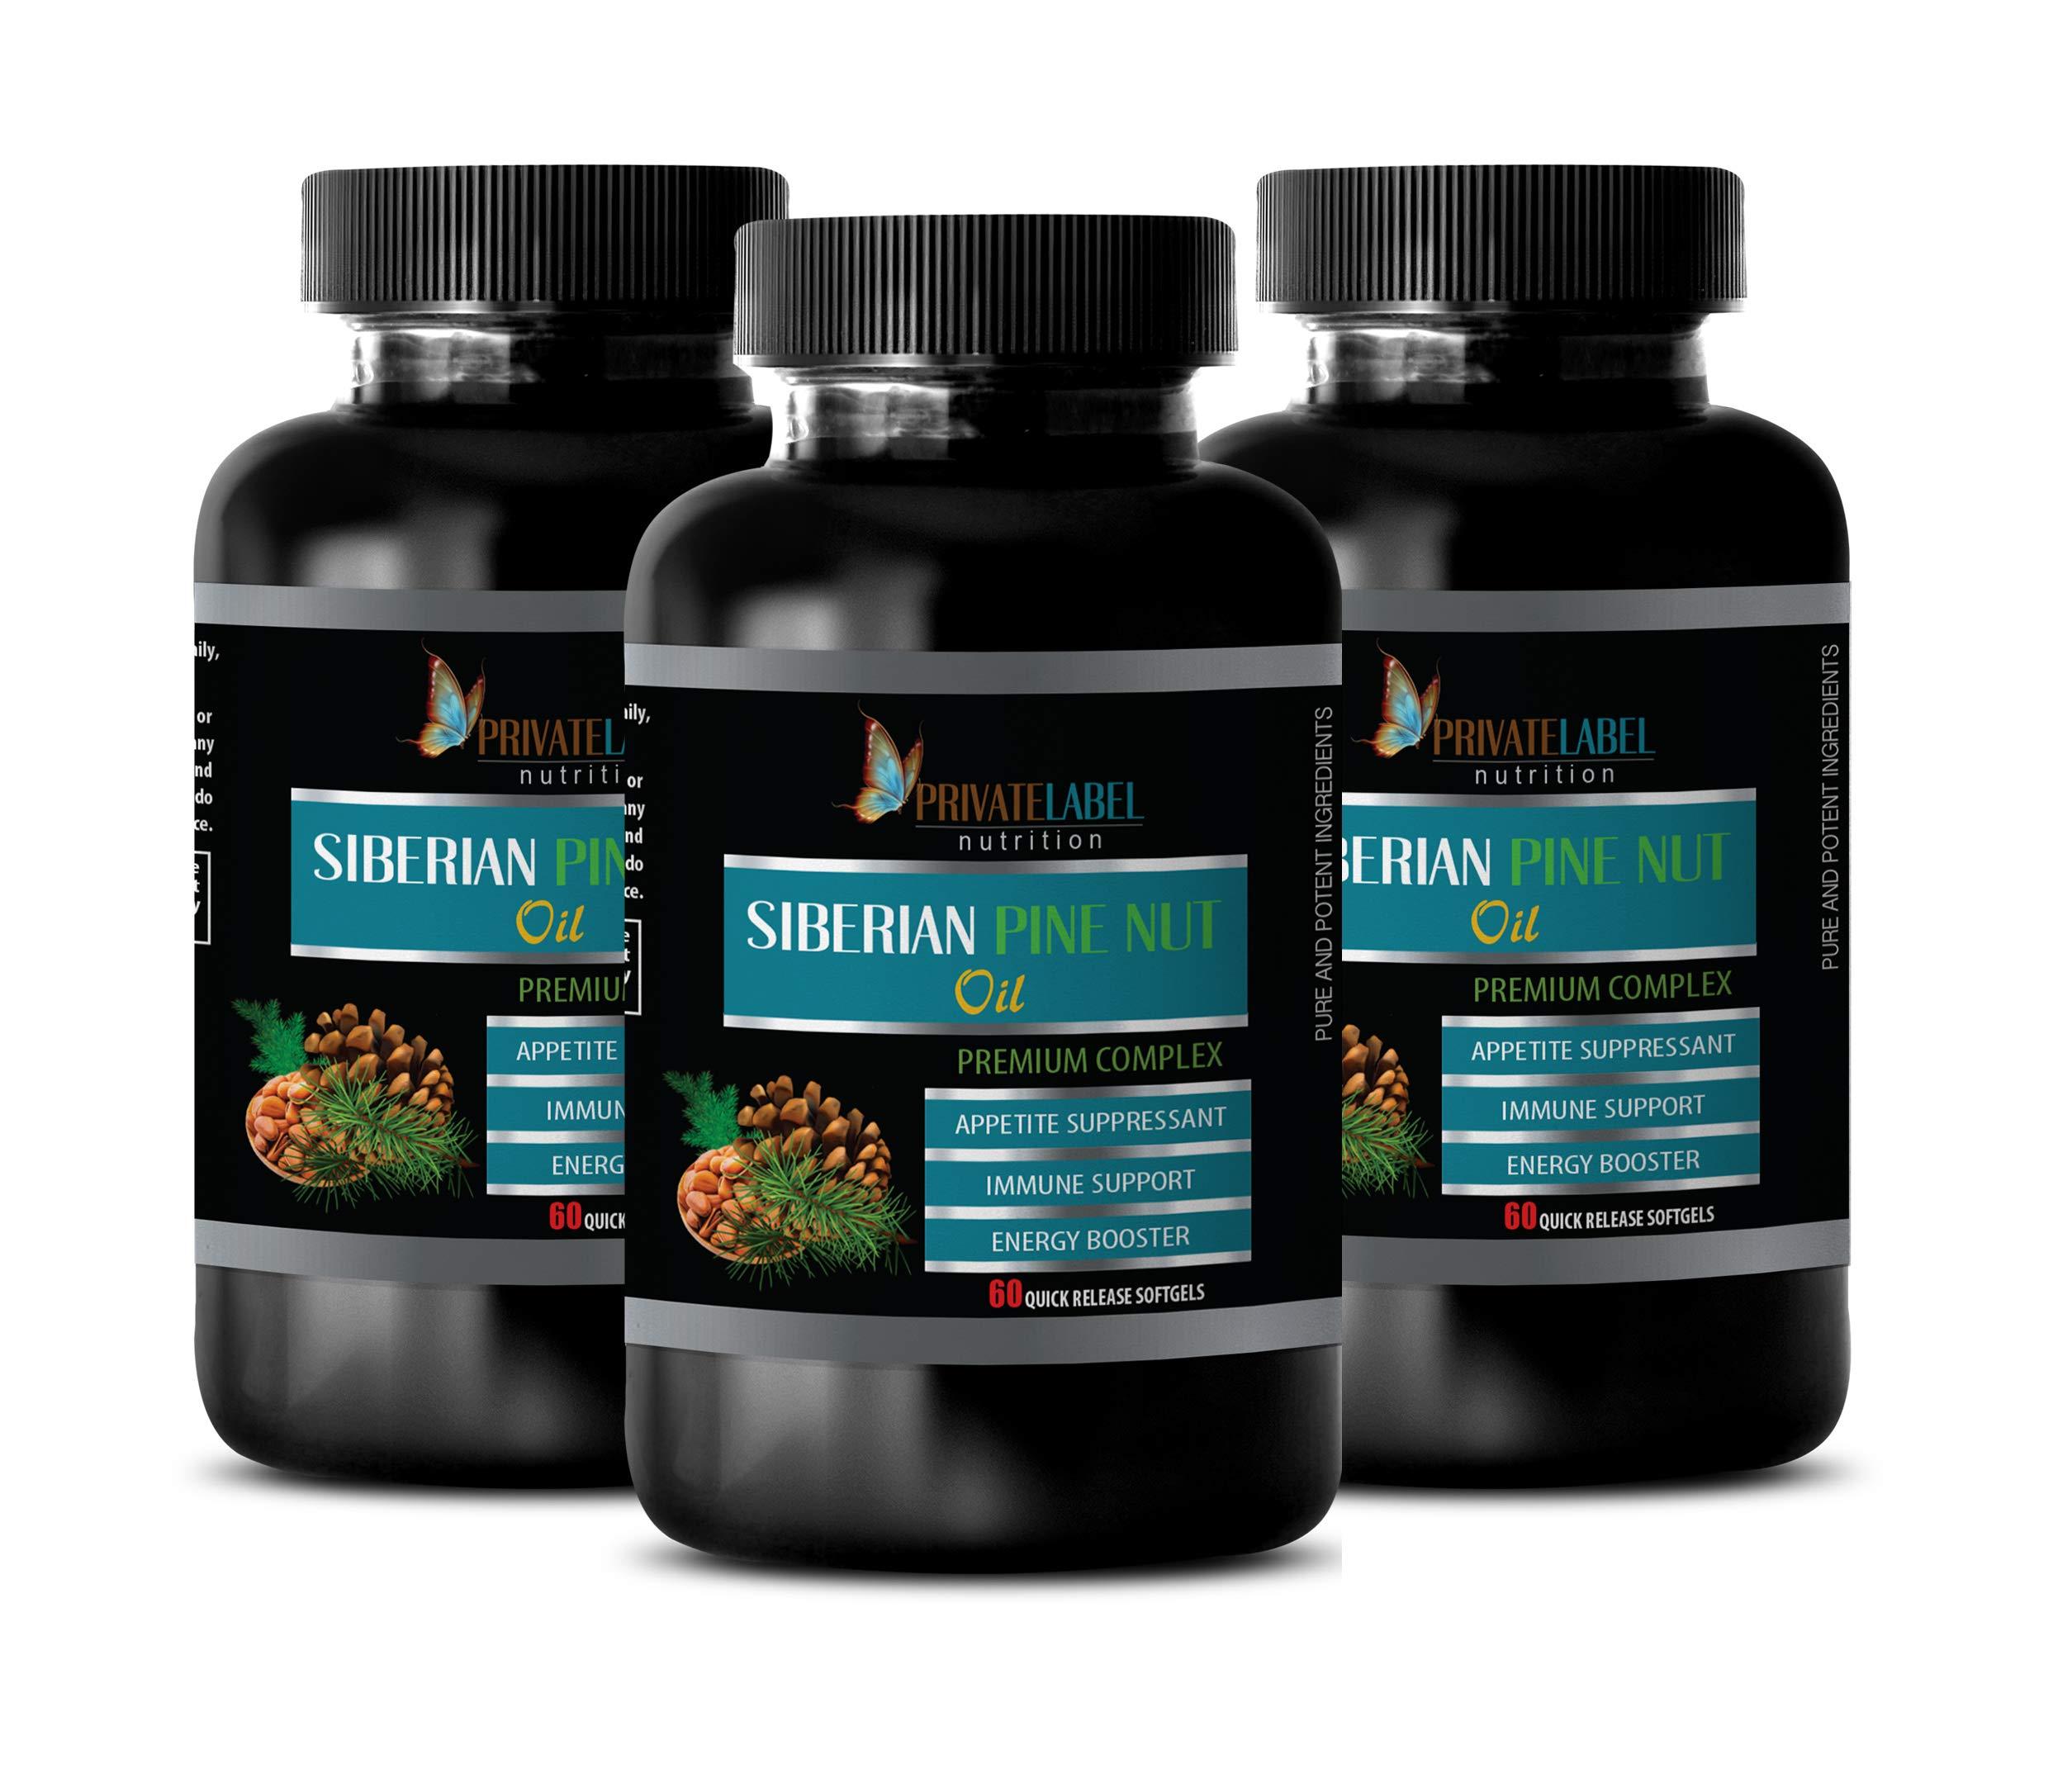 Brain Health Formula - Siberian Pine NUT Oil - Premium Complex - Eye Vision Supplement - 3 Bottles 180 Softgels